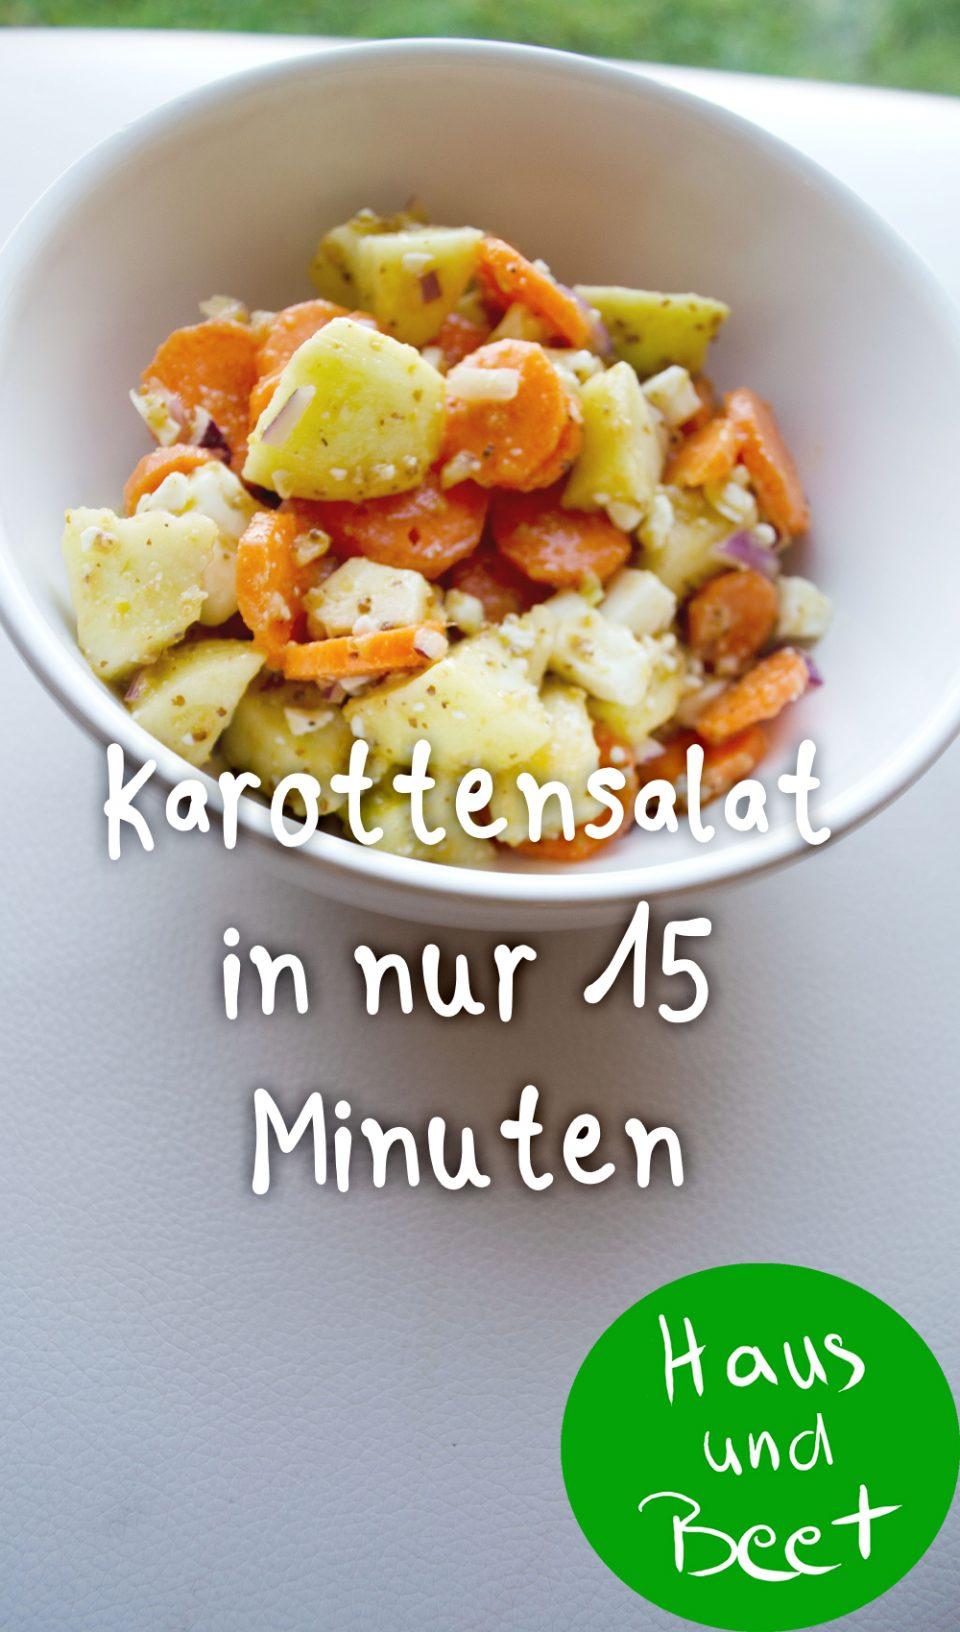 Karottensalat in 15 Minuten